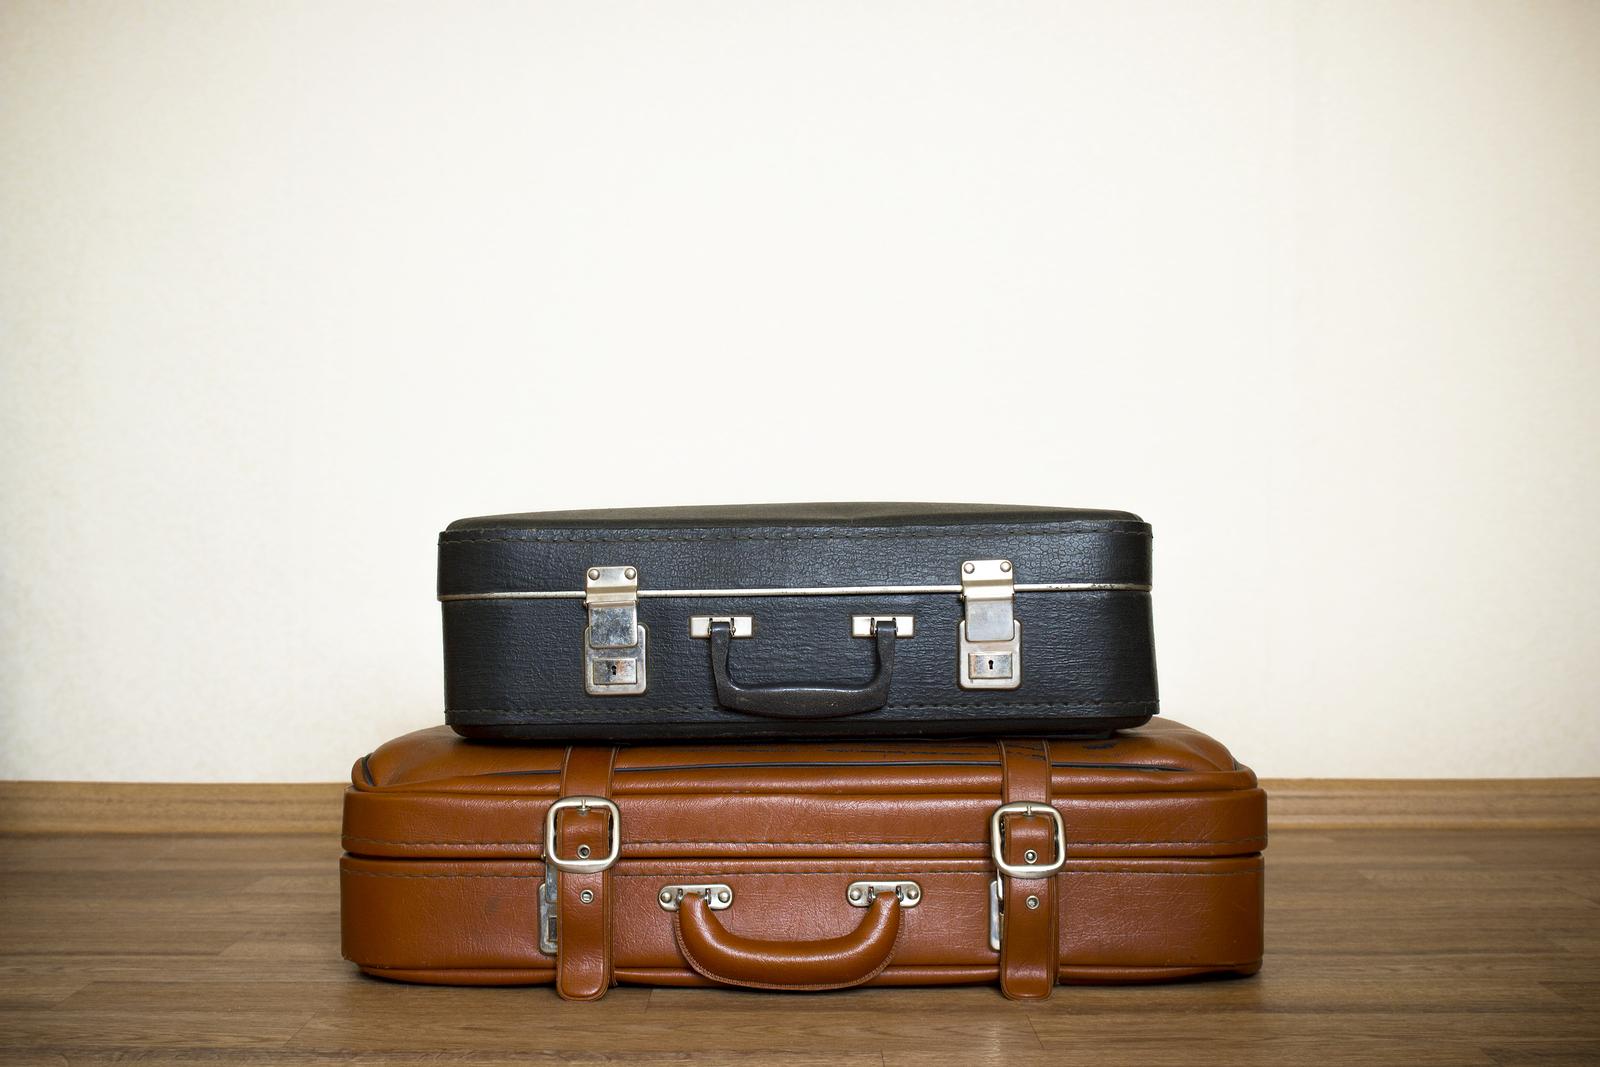 valise-poids